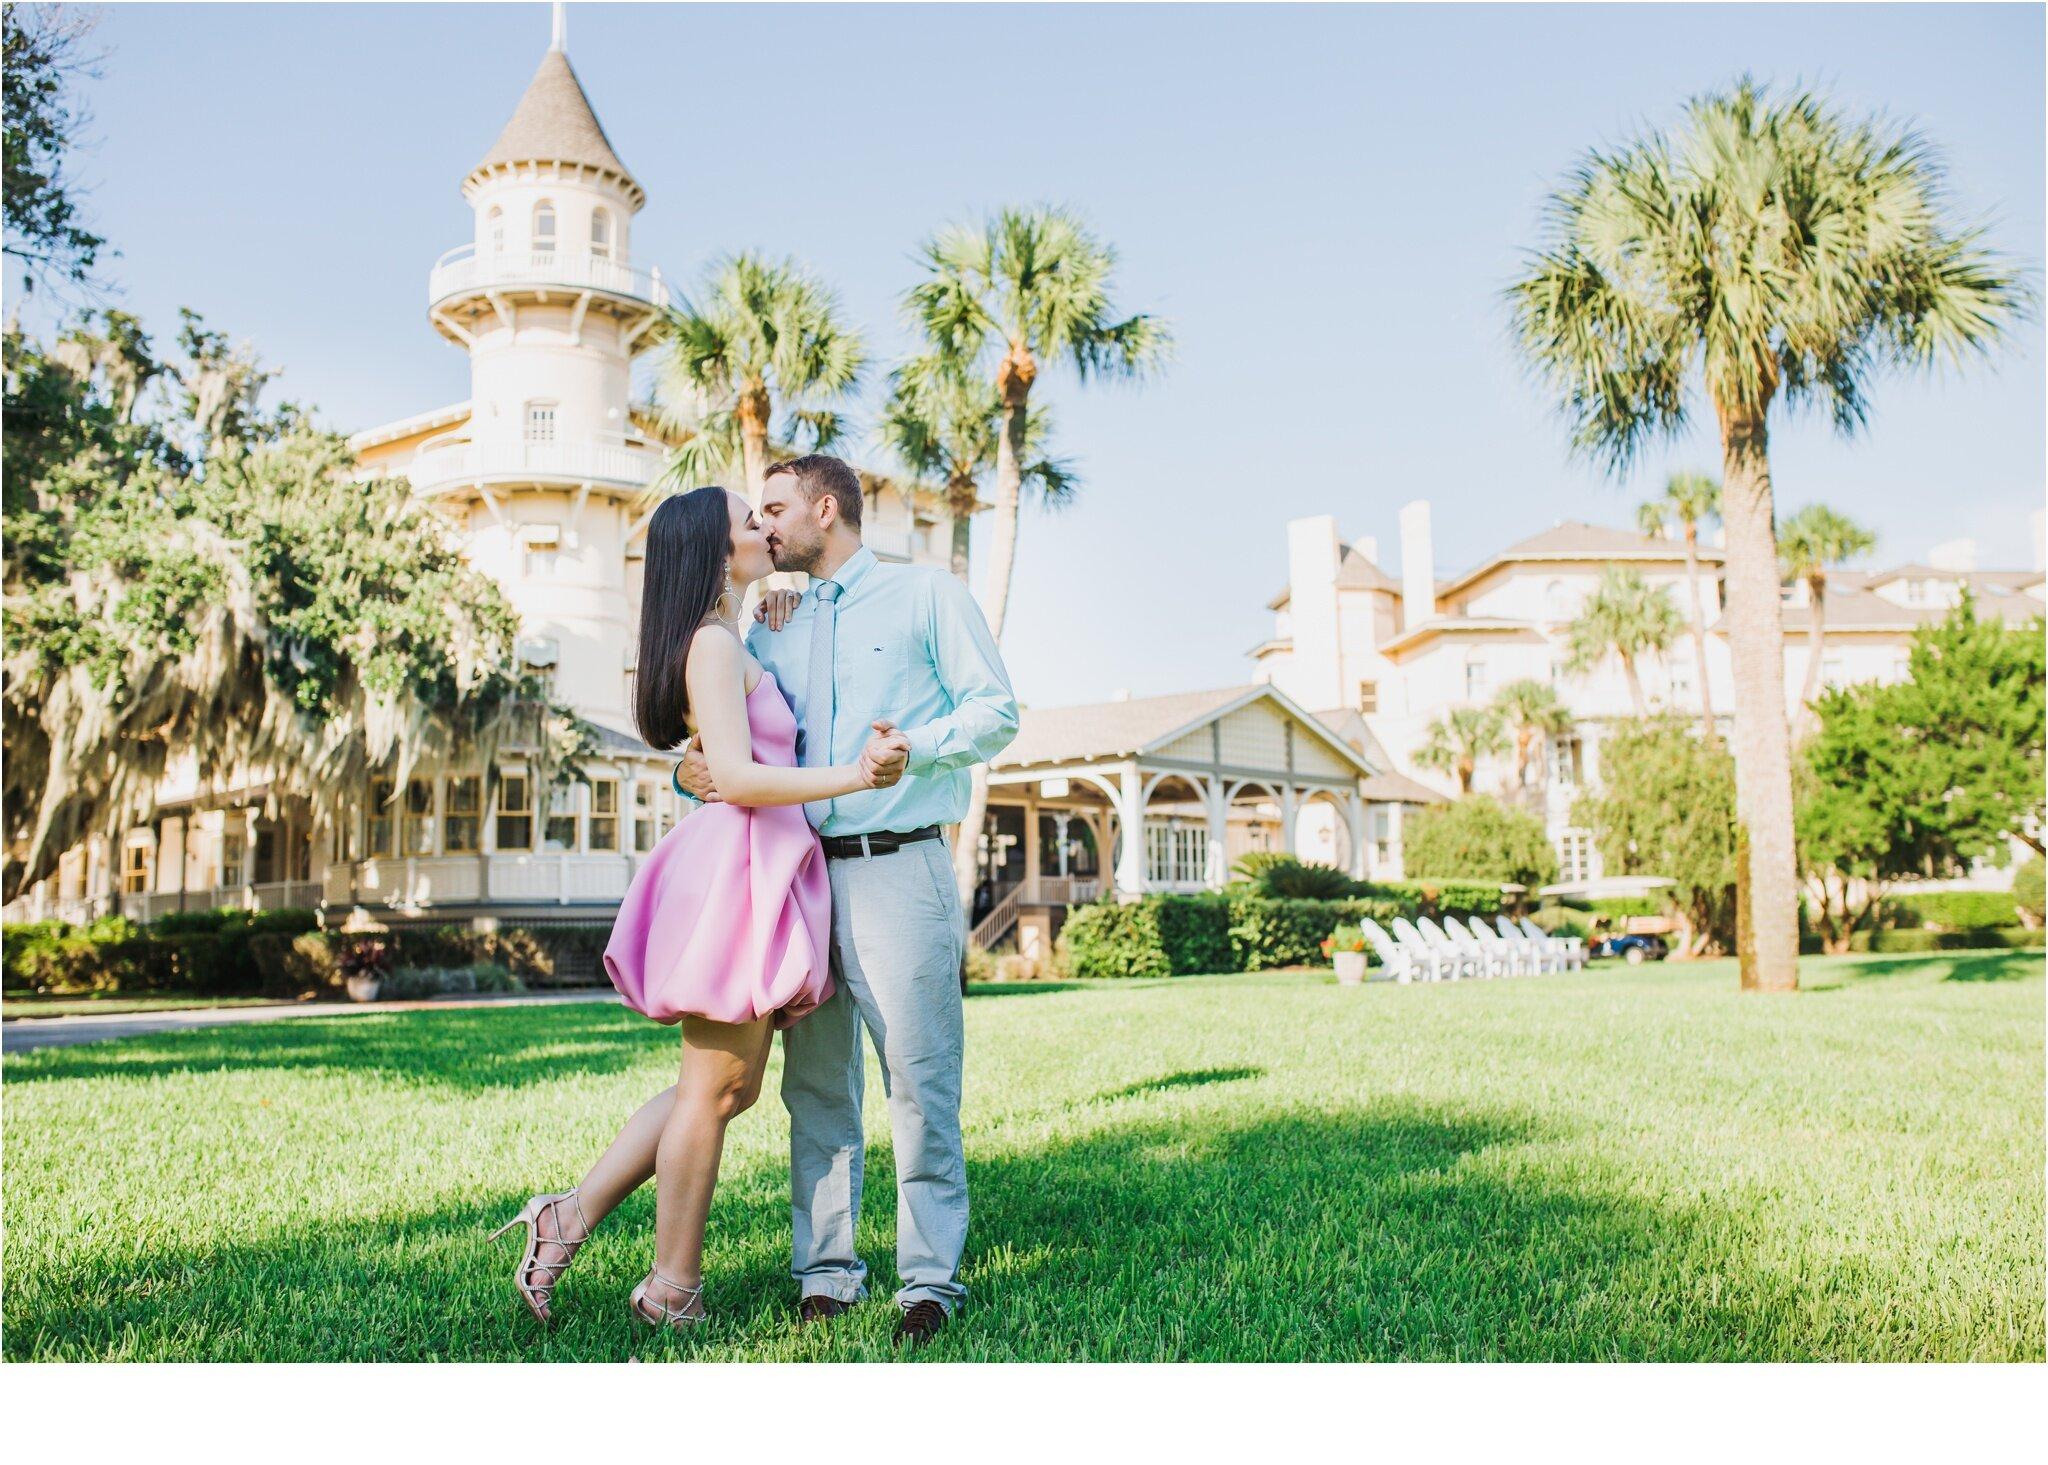 Rainey_Gregg_Photography_St._Simons_Island_Georgia_California_Wedding_Portrait_Photography_1817.jpg